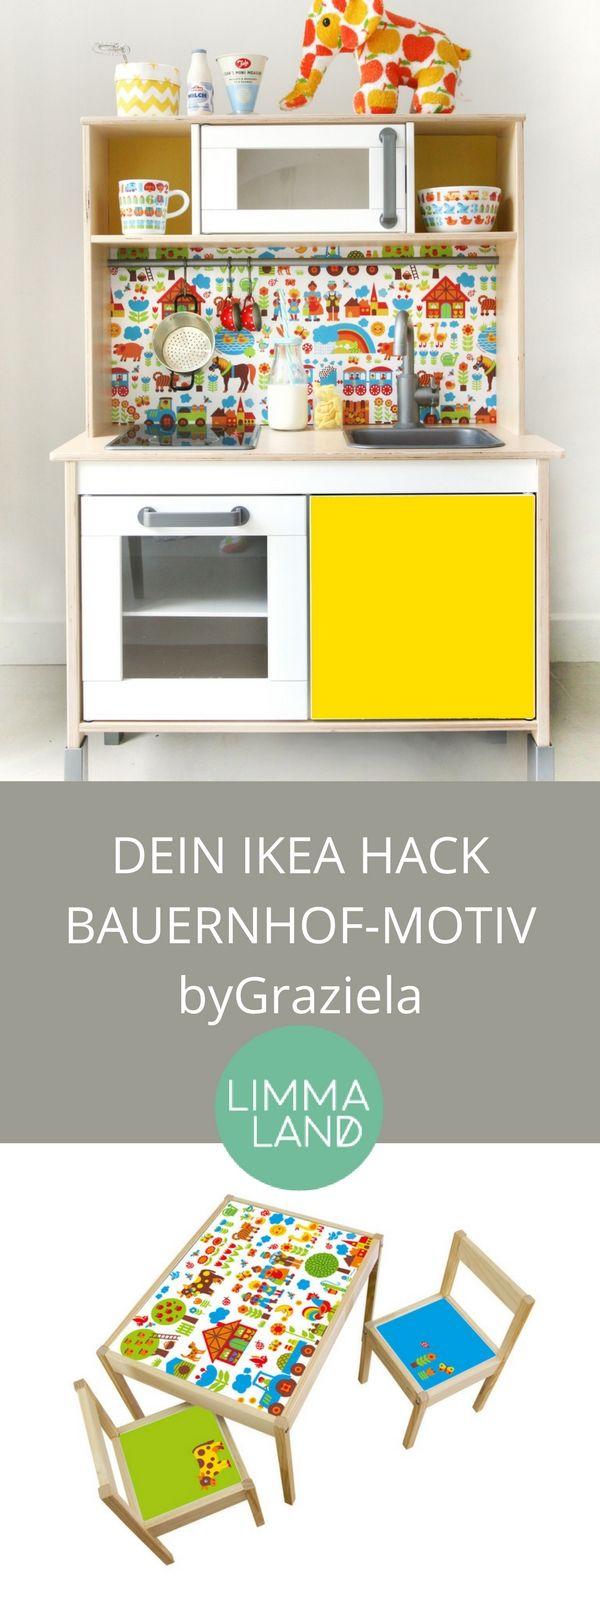 66 best ikea hack - duktig kinderküche images on pinterest, Gestaltungsideen